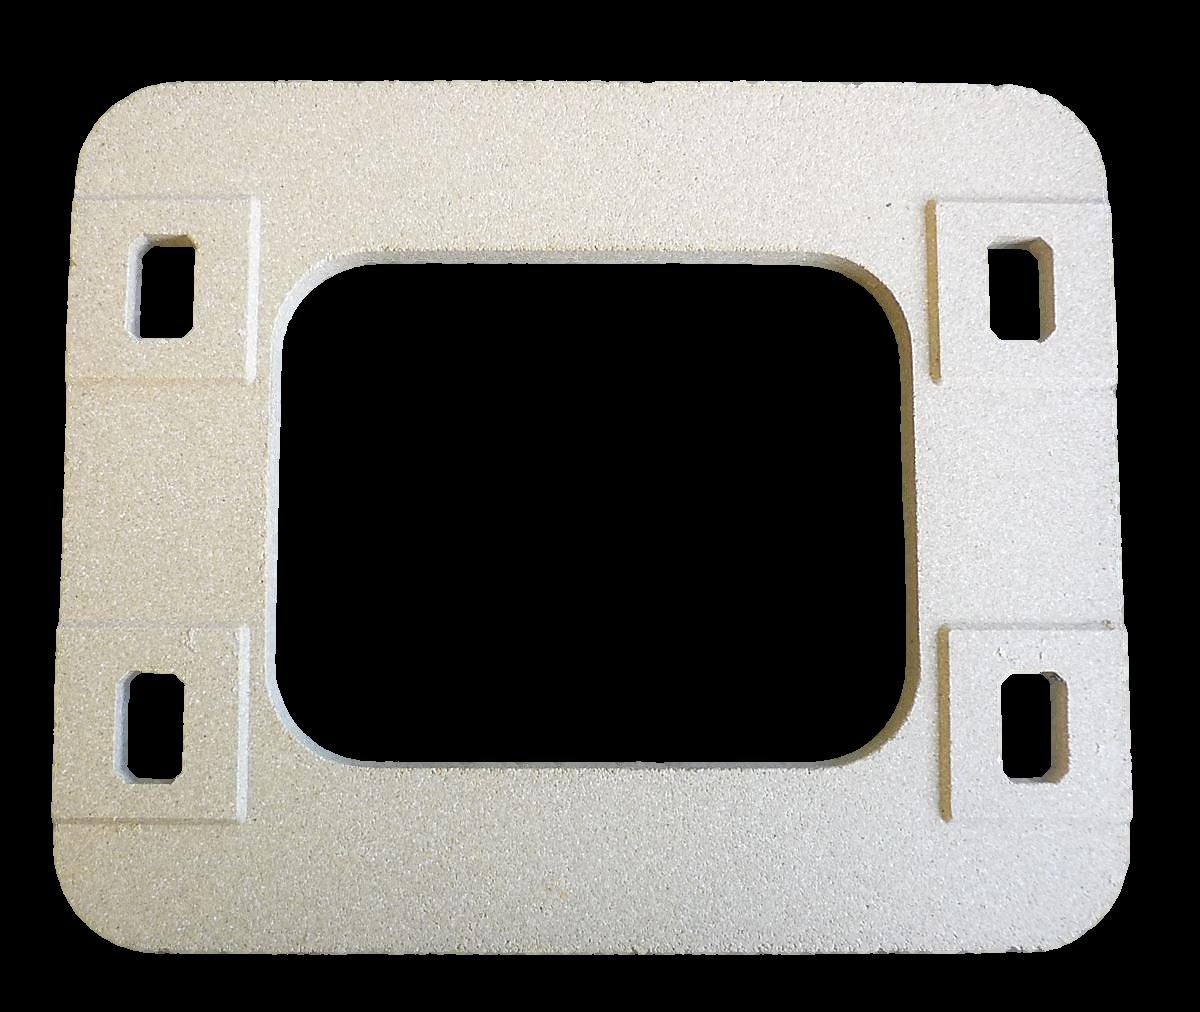 Tile Crank Base or Cover for 8 Inch Tile